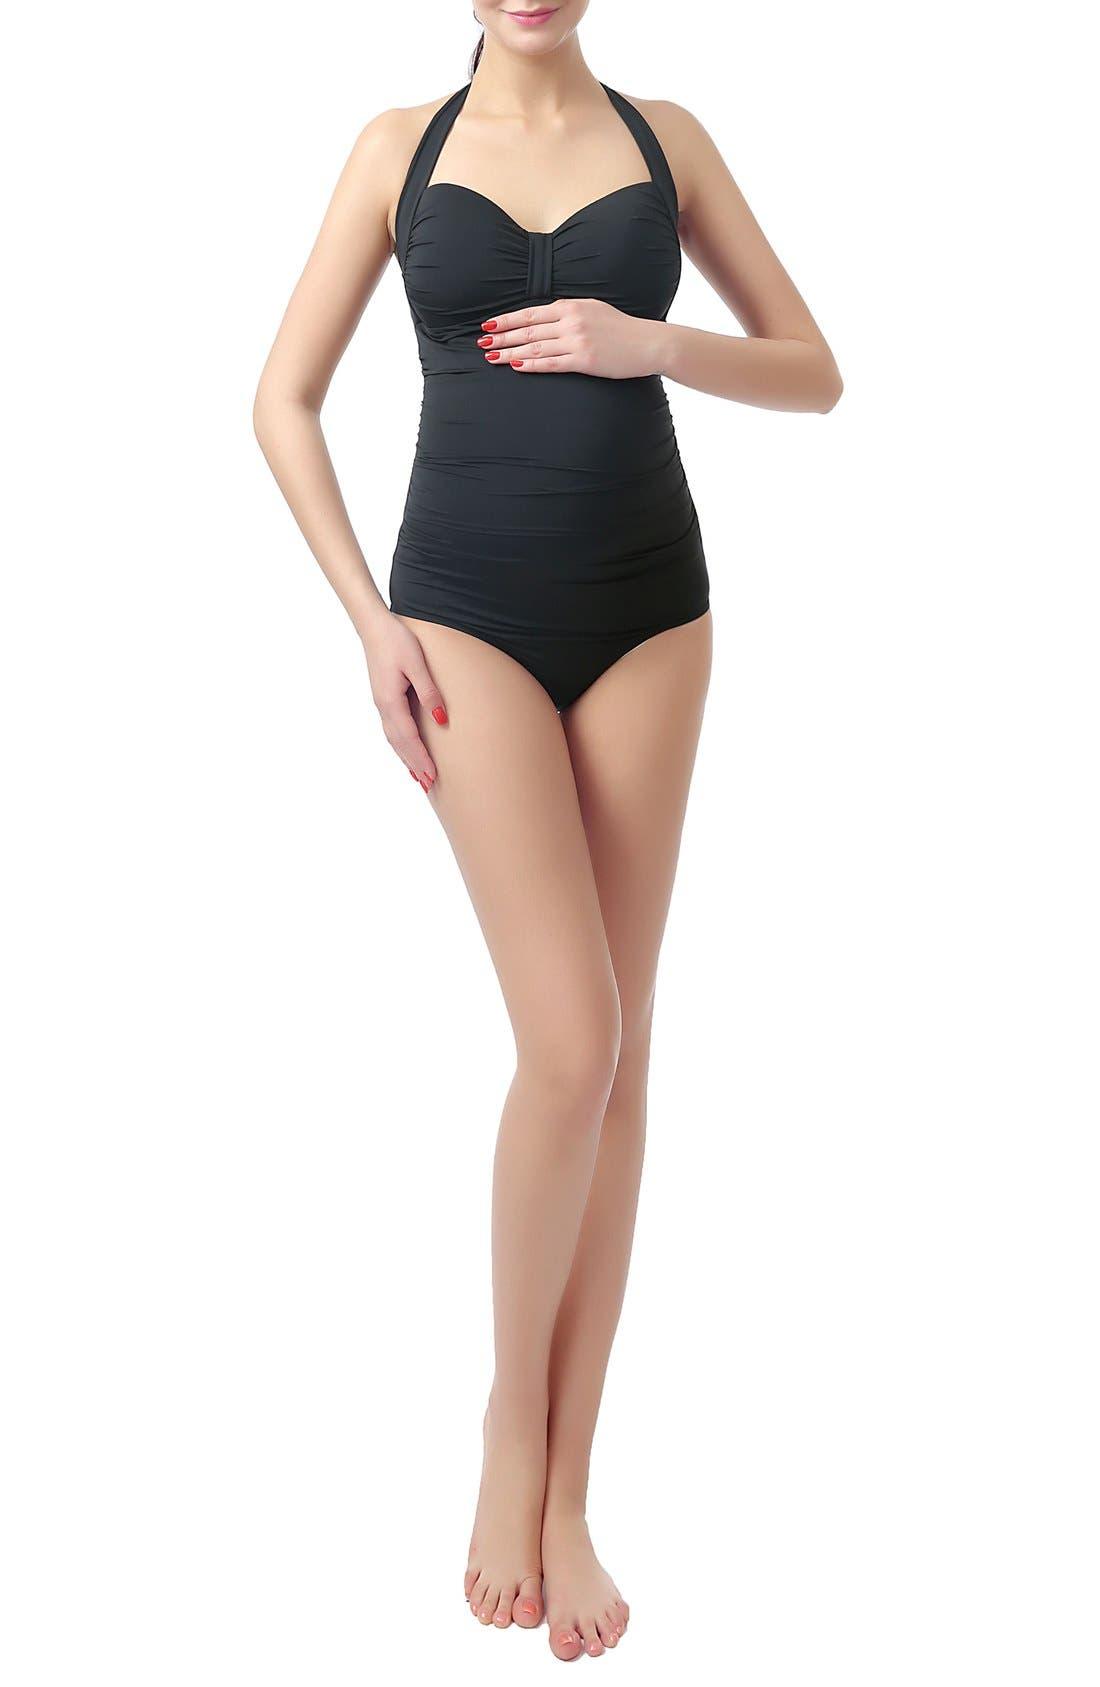 Main Image - Kimi and Kai 'Dana' Maternity One-Piece Halter Swimsuit